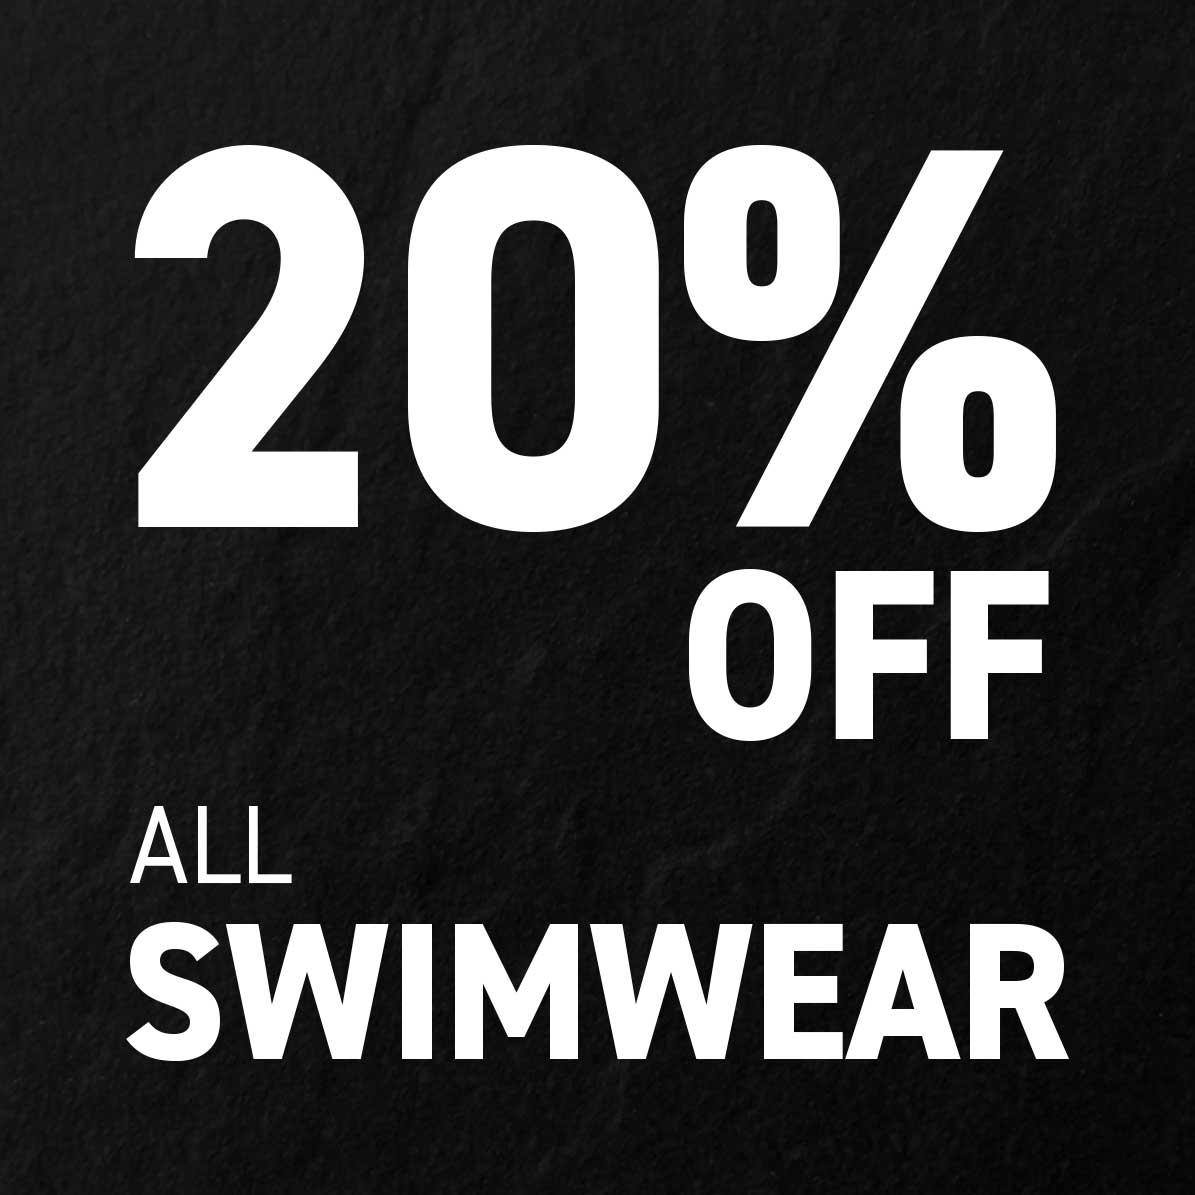 Men's Swimwear| Topdrawers